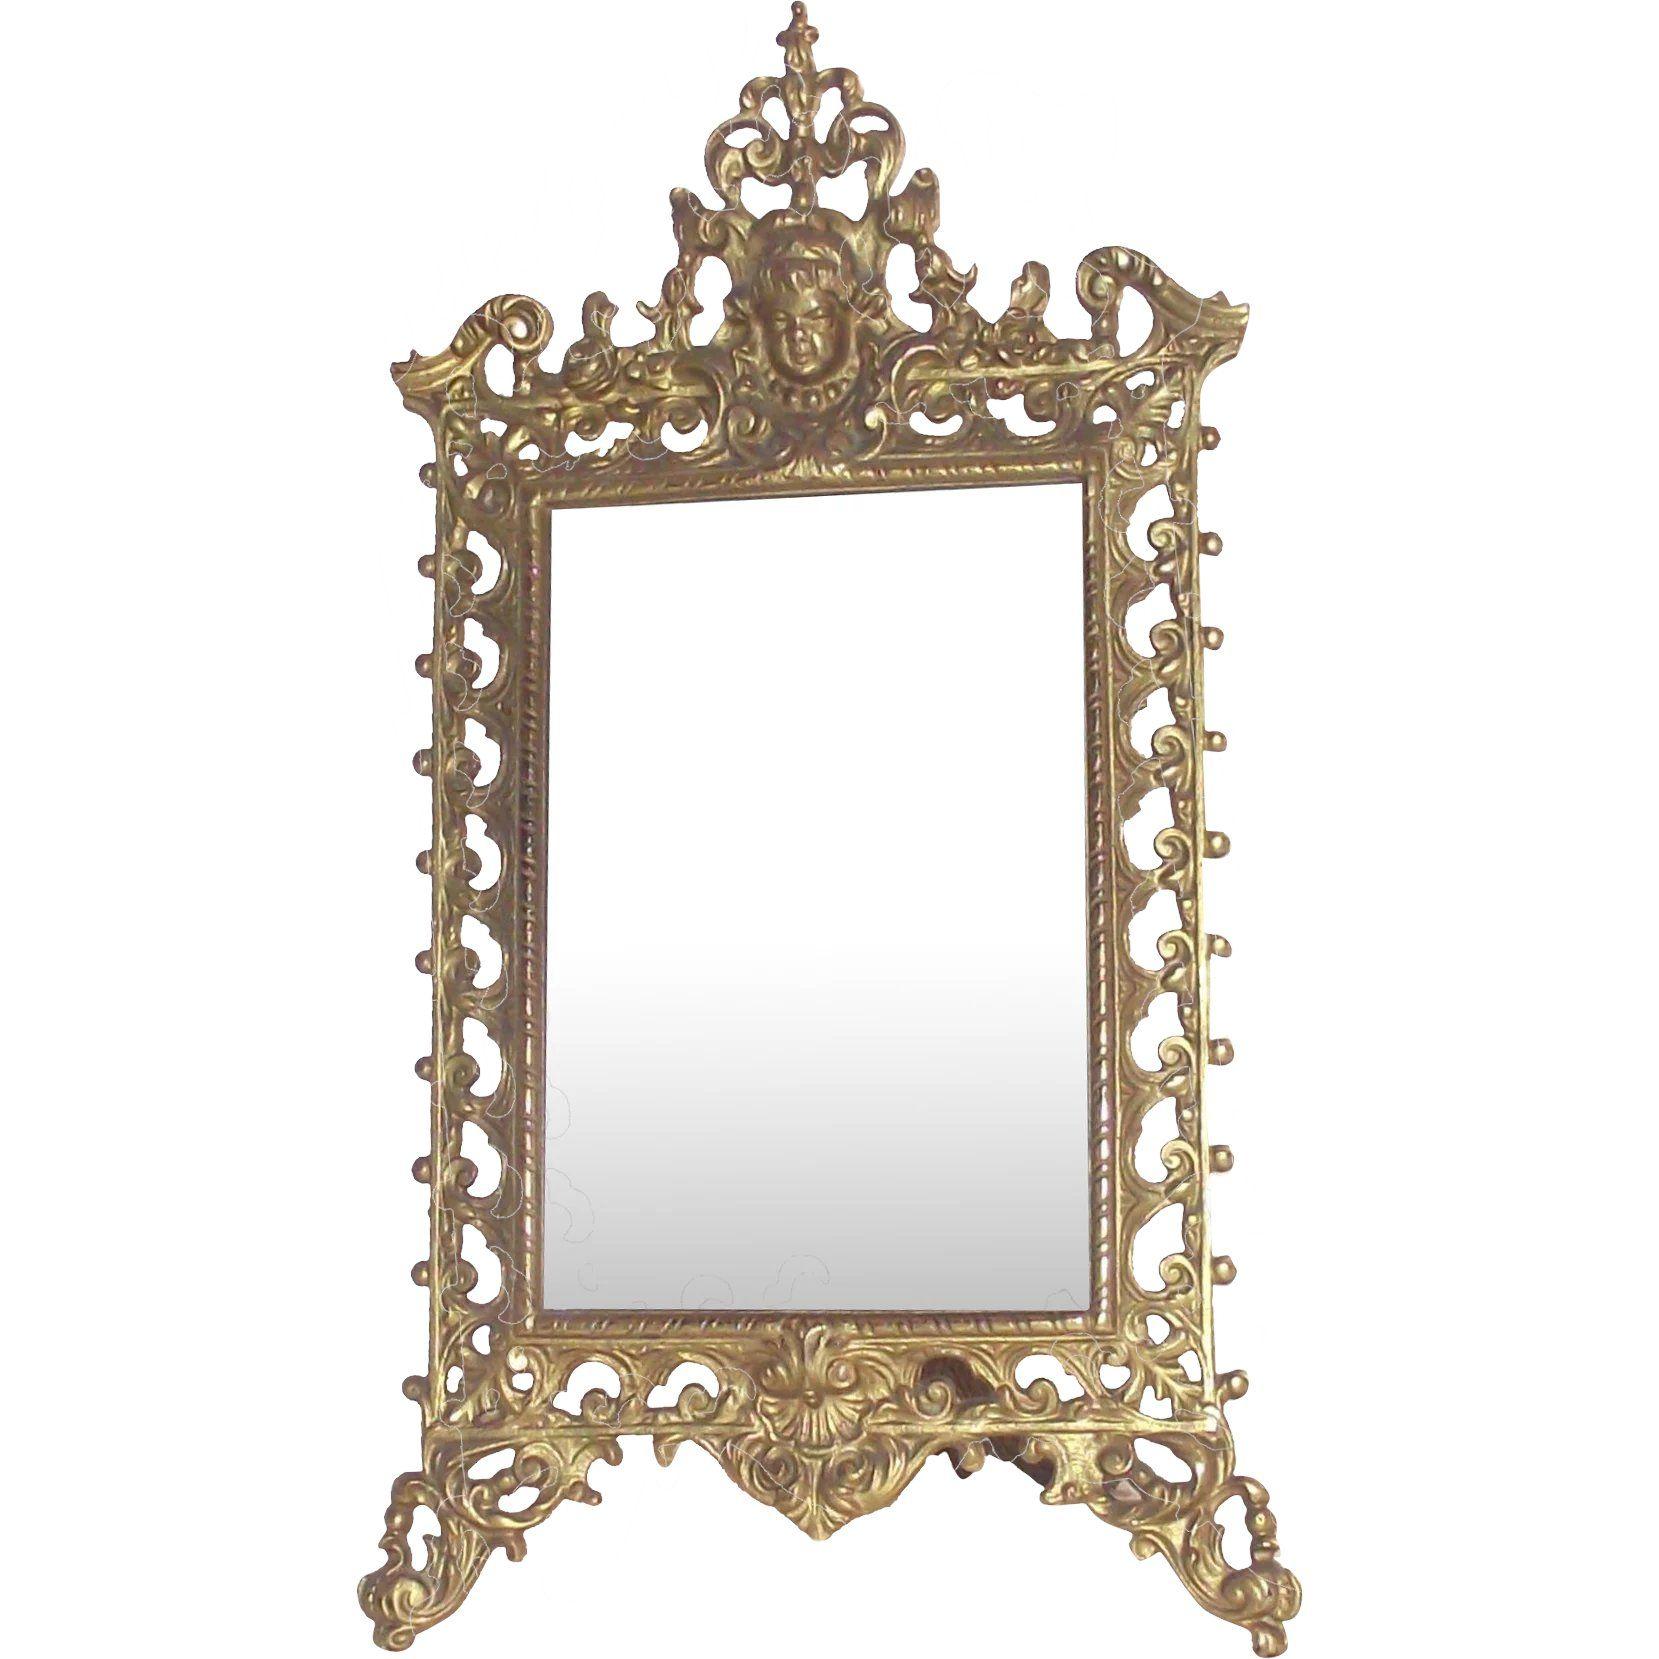 Summerhome Interior Design: Victorian Gilt Table Mirror With Puti Or Cherub A Perfect